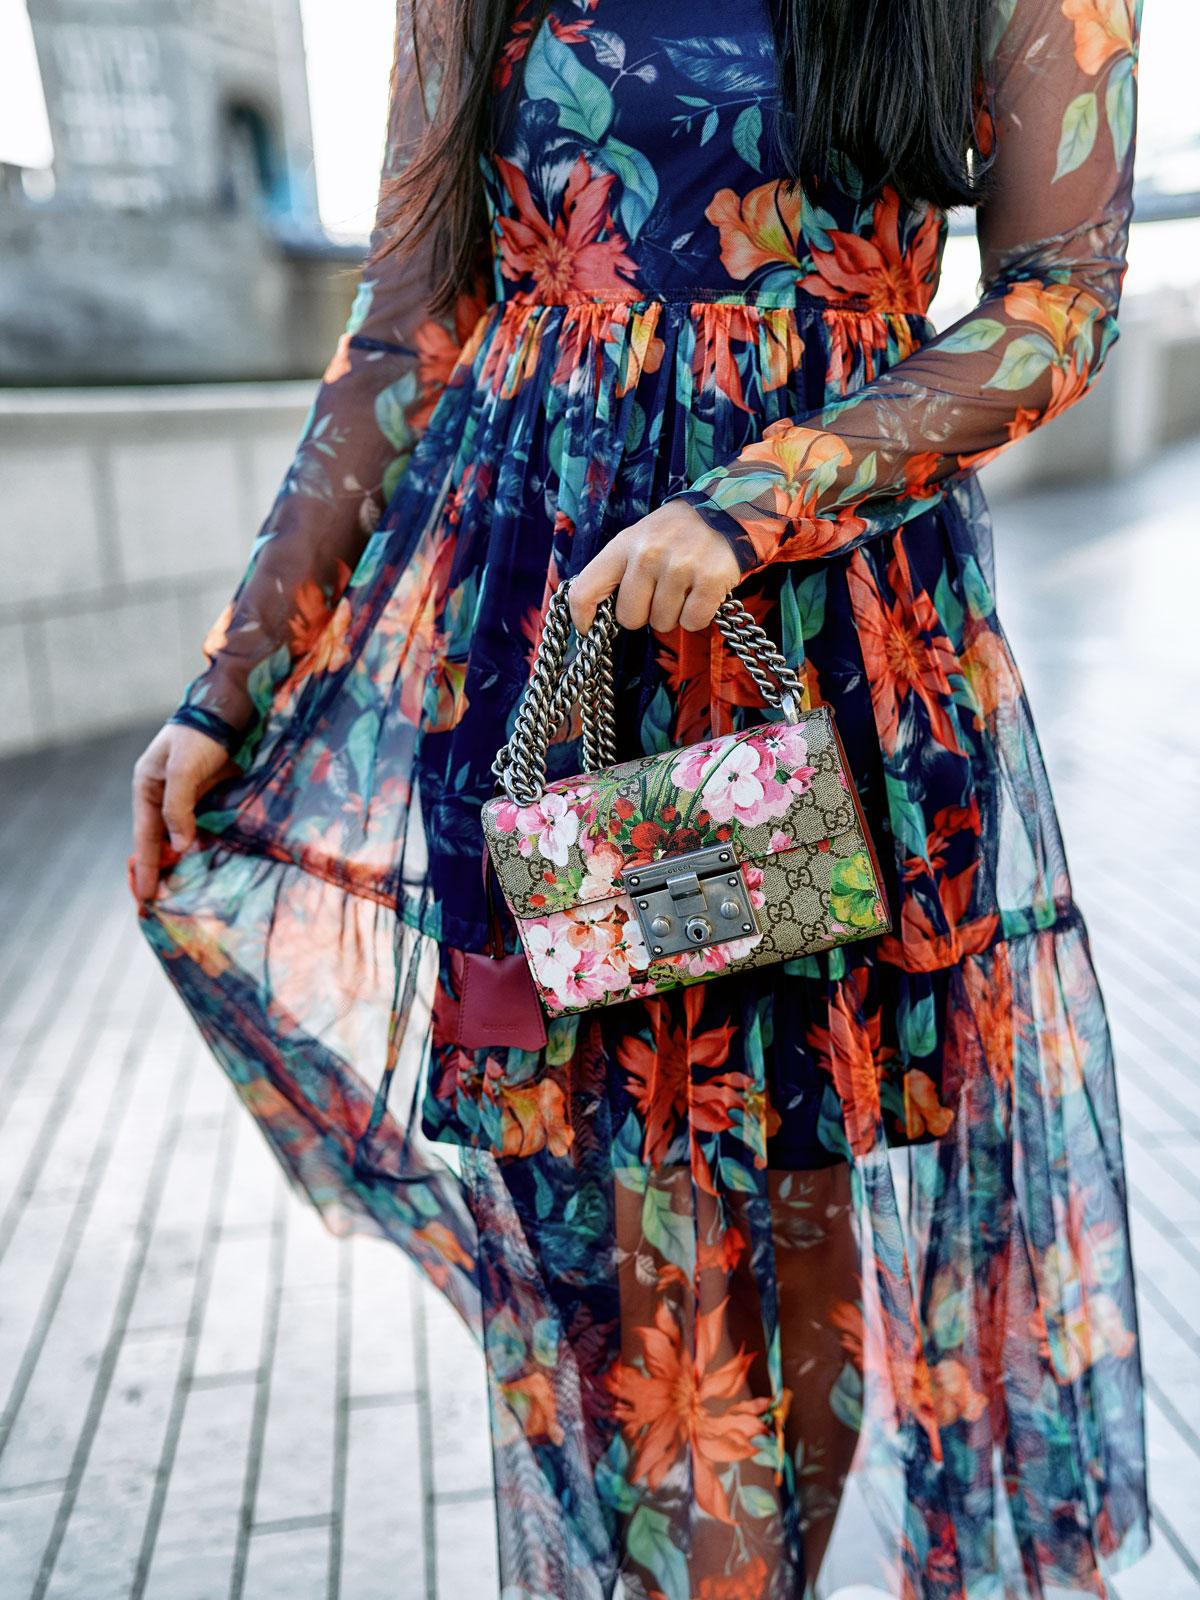 fashionambit-travelblog-muenchen-modeblog-deutschland-blogger-modeblogger-fashionblogger-bloggerdeutschland-lifestyleblog-munich-style-blog-london-insider-tipps